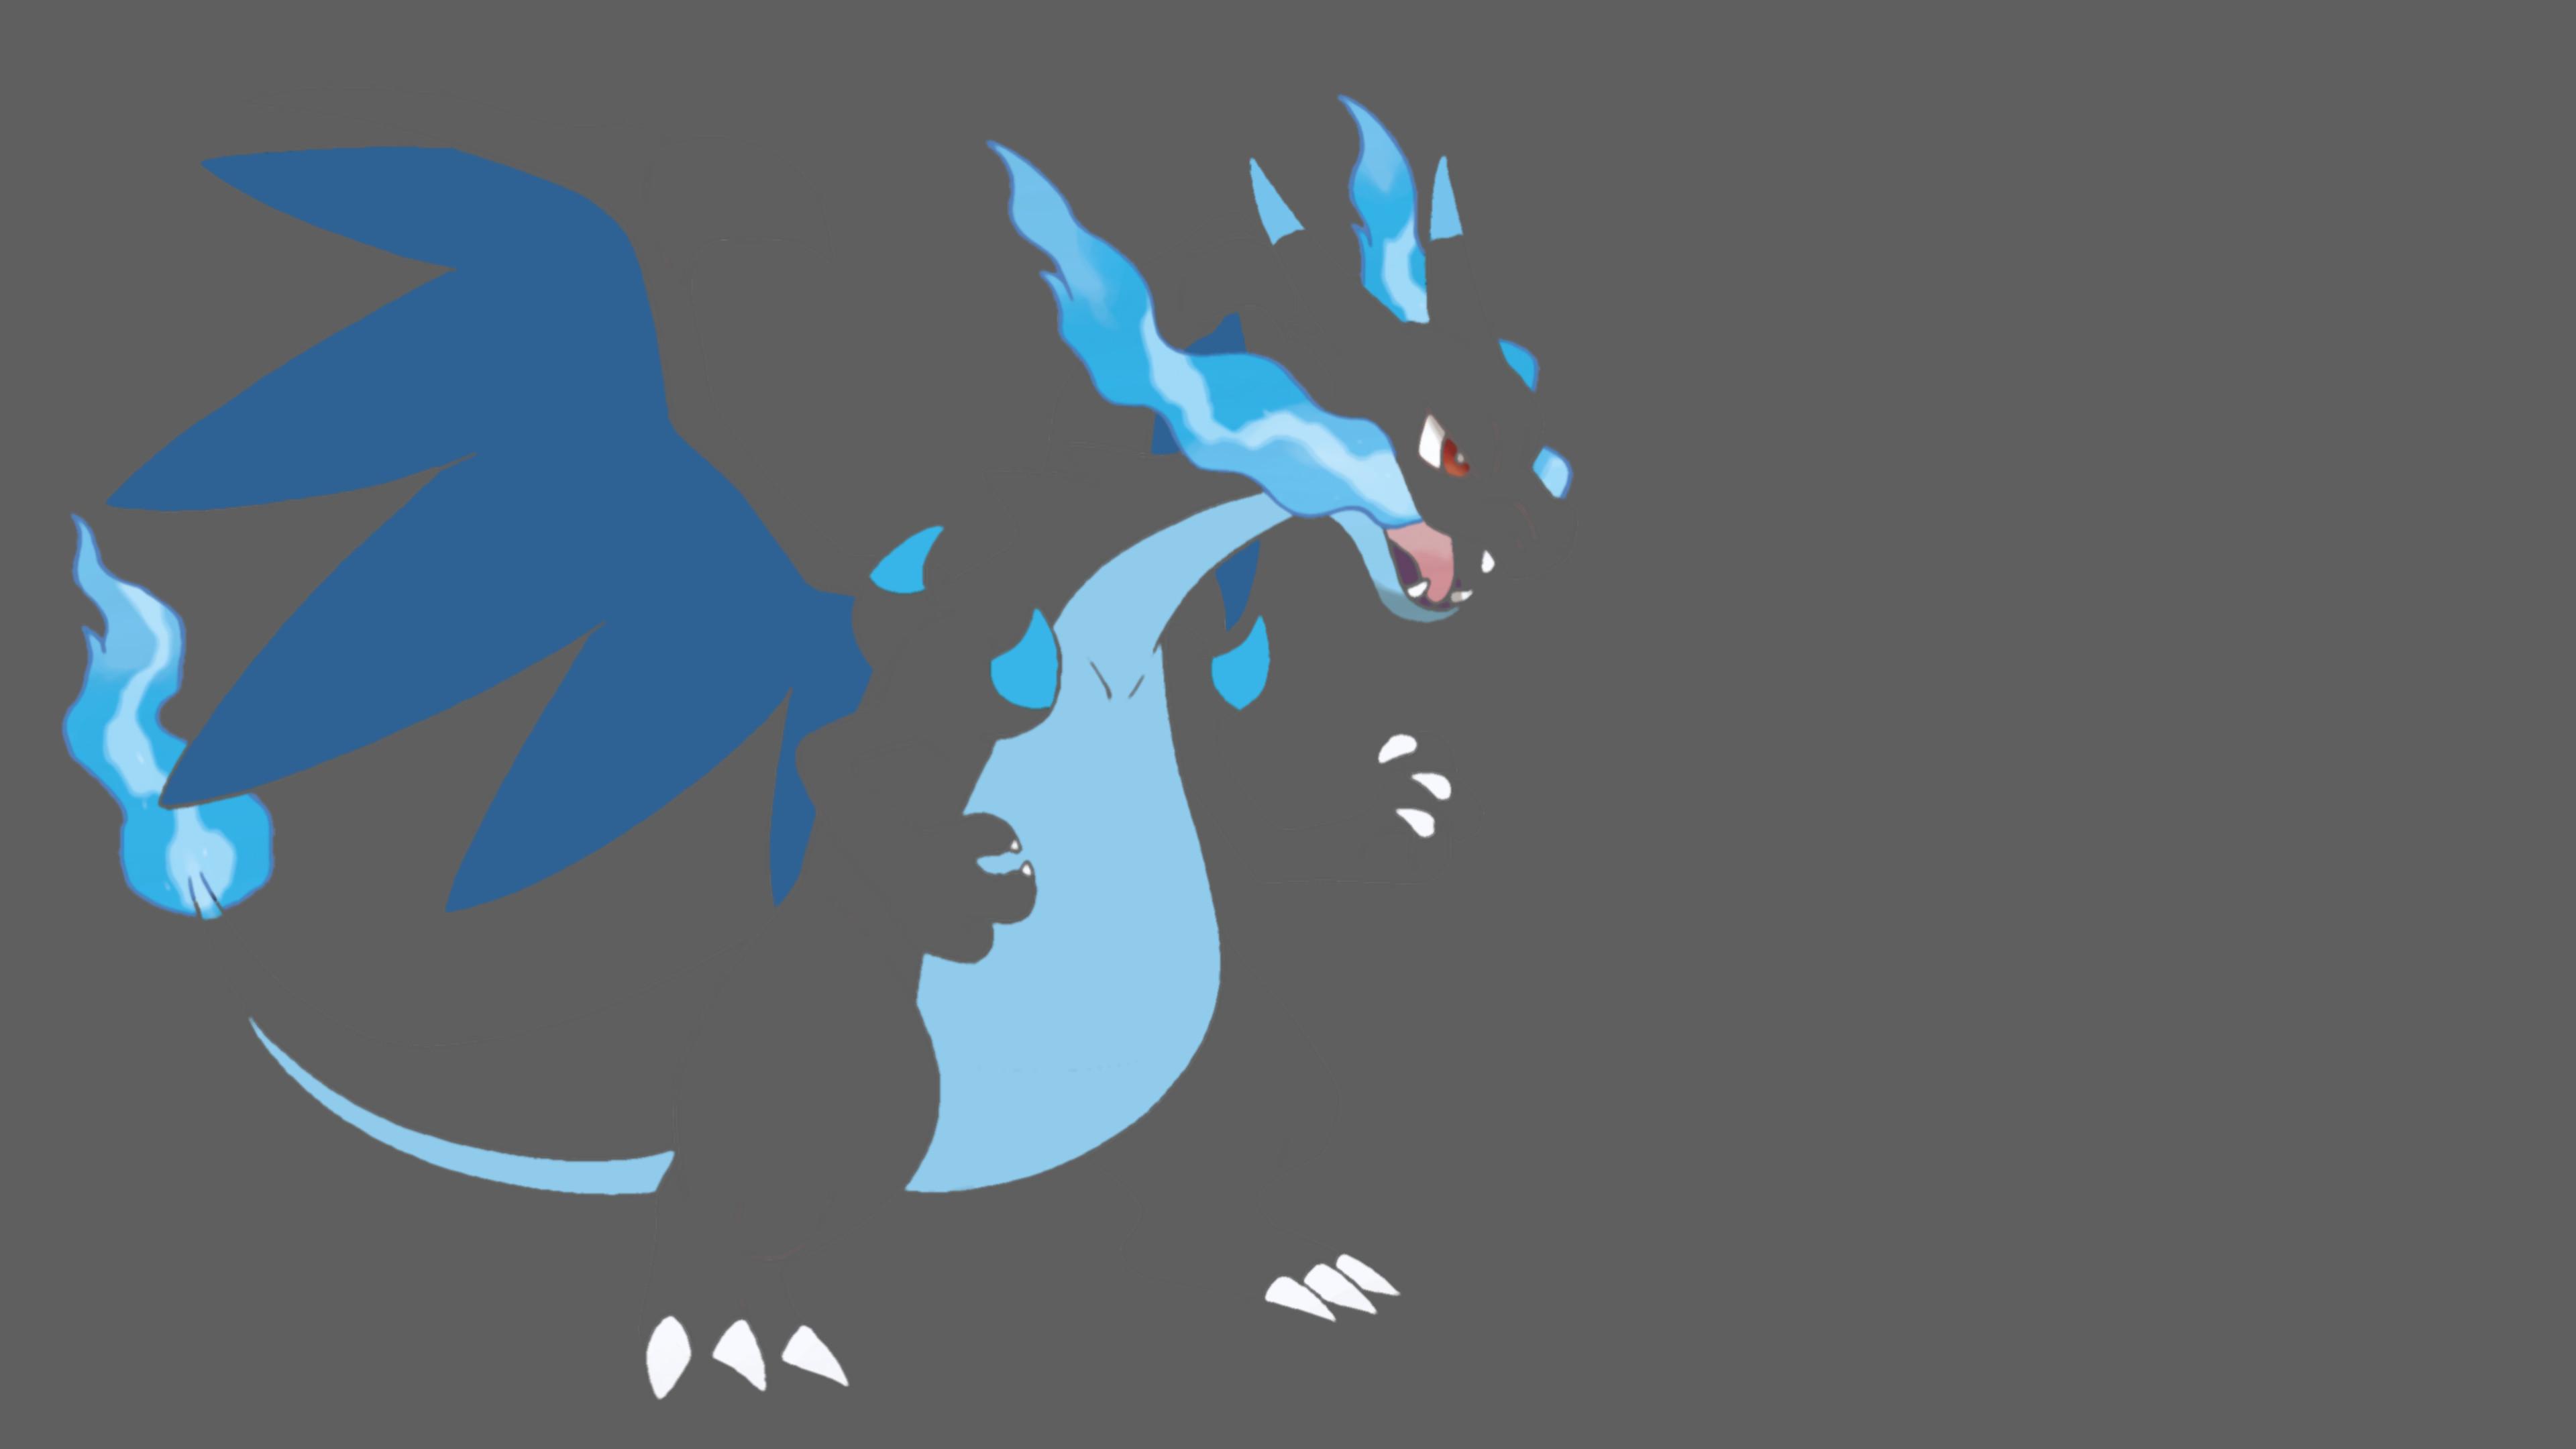 Pokemon Charizard Wallpaper Pokemon – charizard x